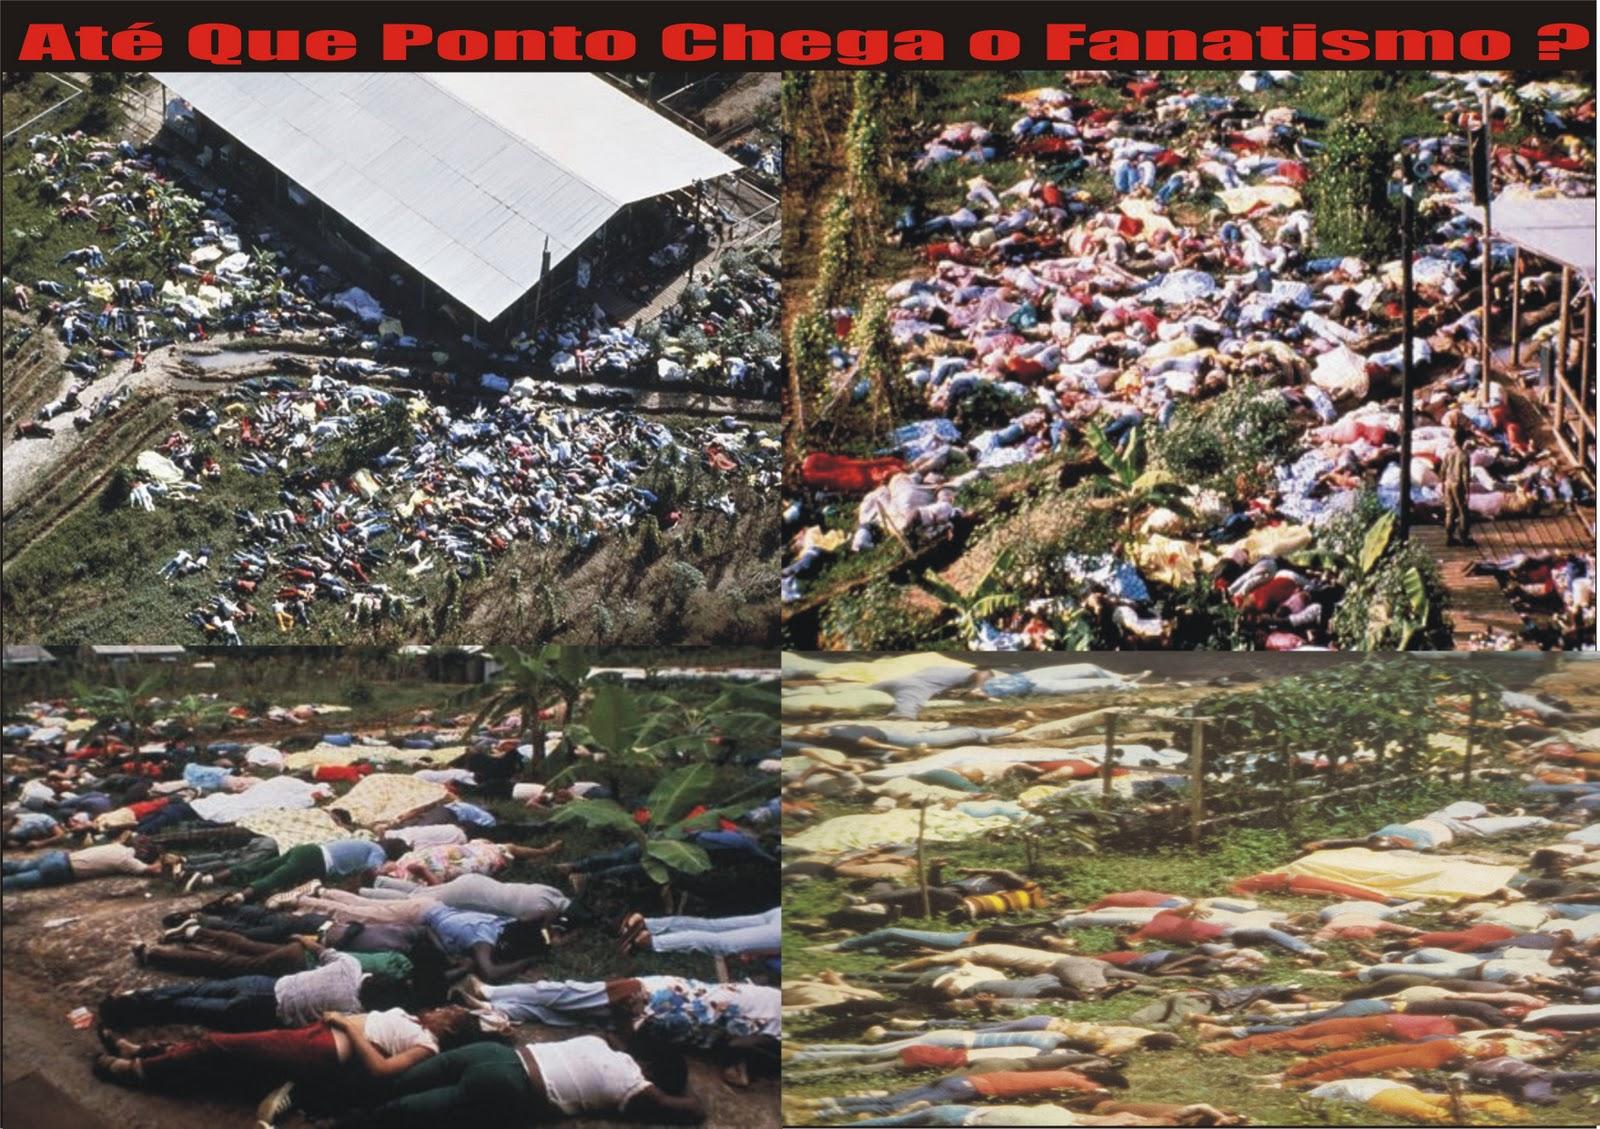 jim jones and the jonestown massacre More than 900 americans died in jonestown on nov 18, 1978 -- the largest single mass death until 9/11.